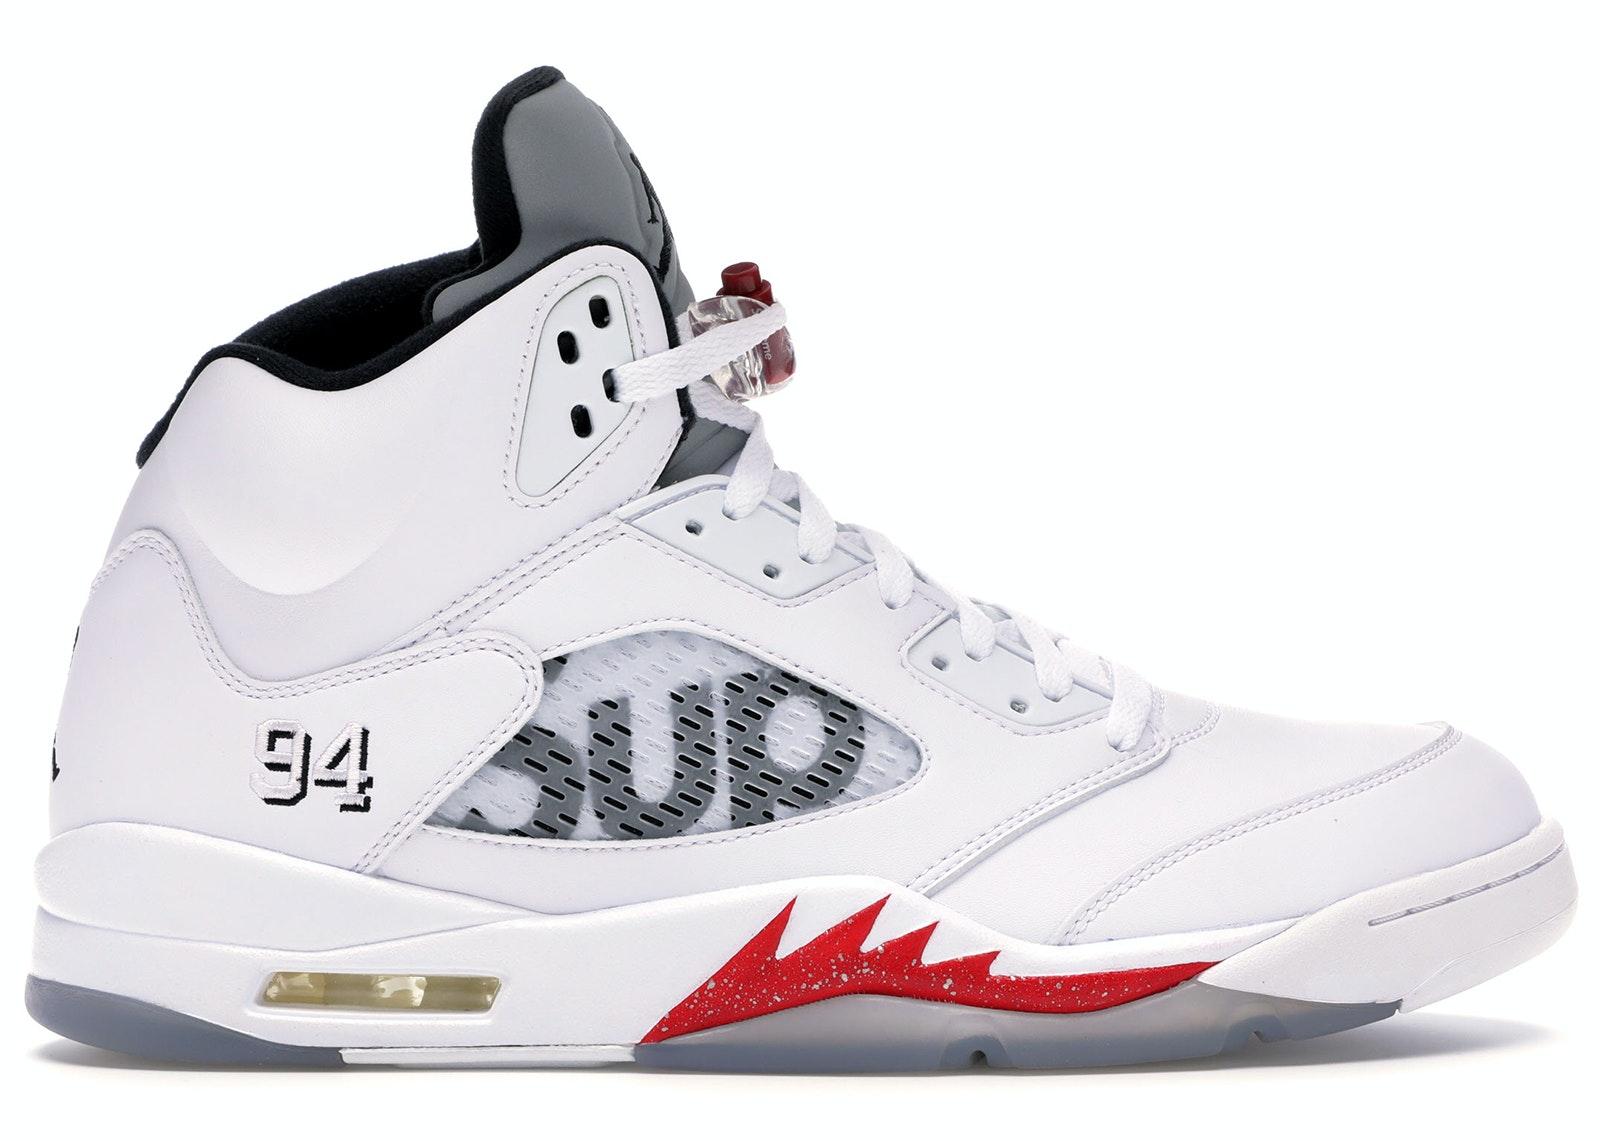 Jordan 5 Retro Supreme White